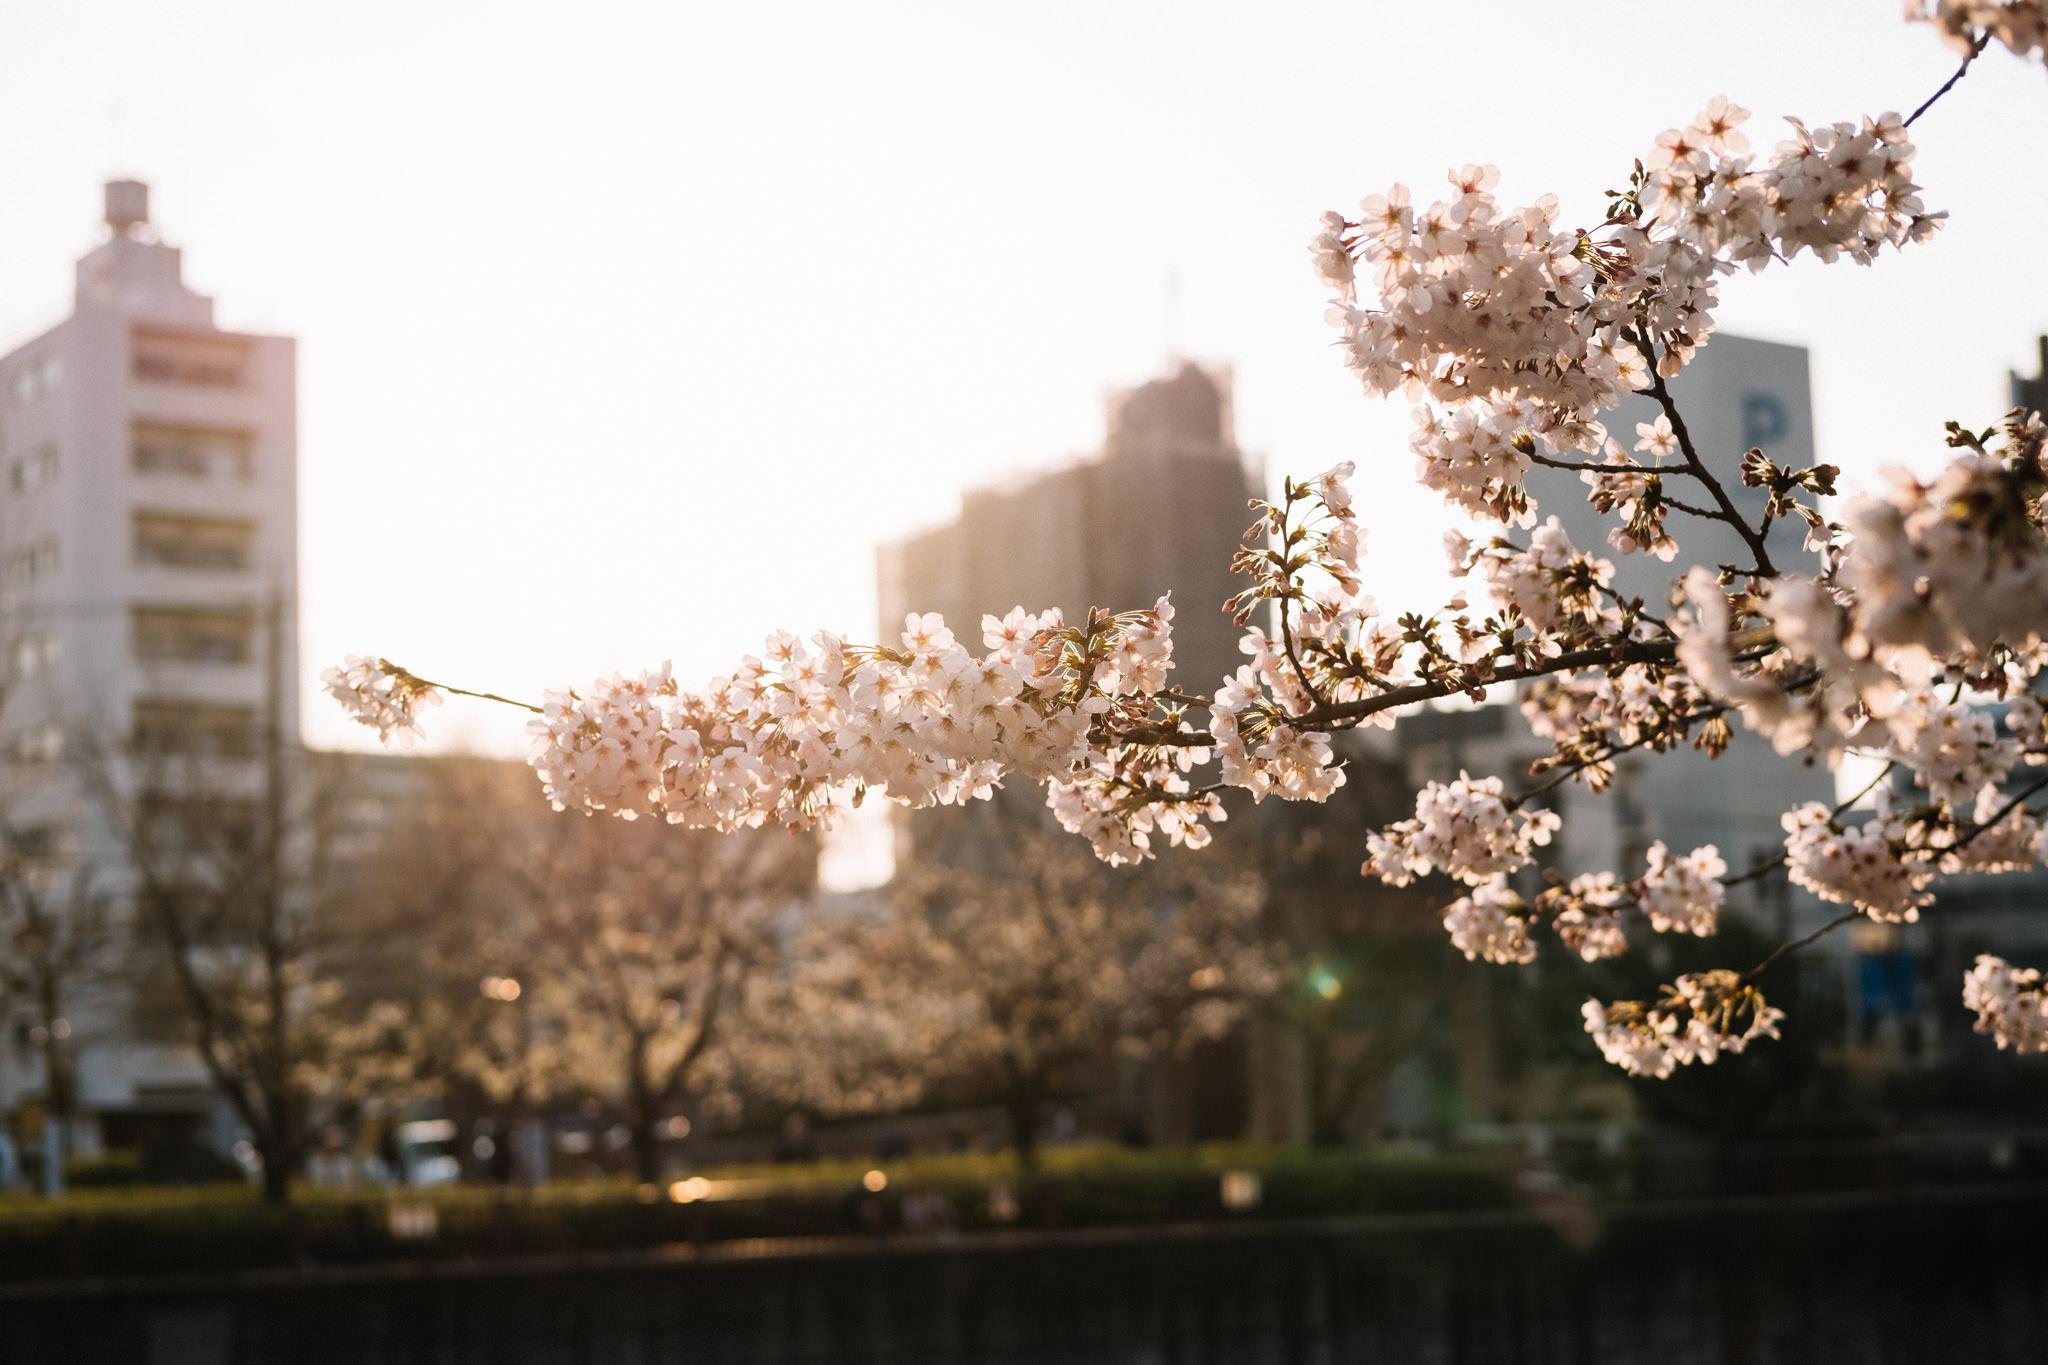 chris_eberhardt_japan_travel_reise_nippon-29.jpg